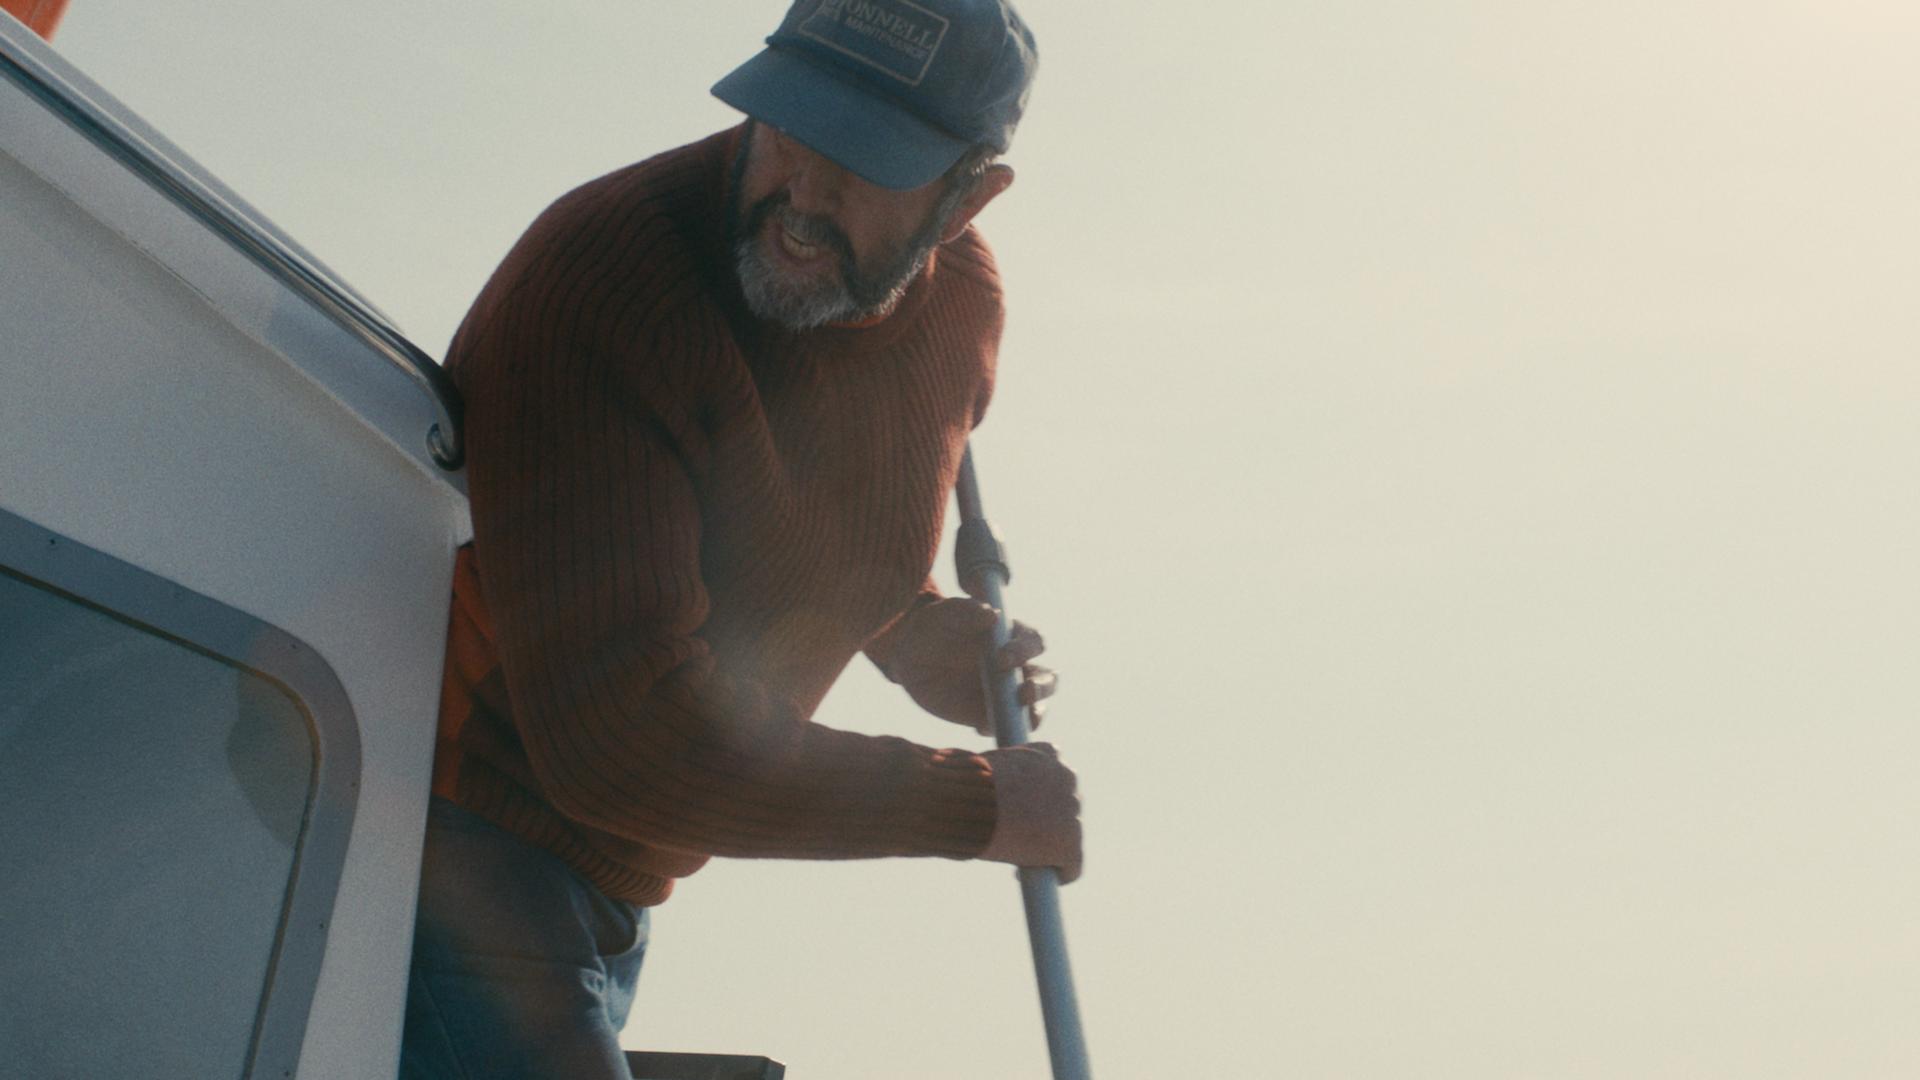 KYLE MACFADZEAN - Screen+Shot+2018-08-25+at+11.30.52